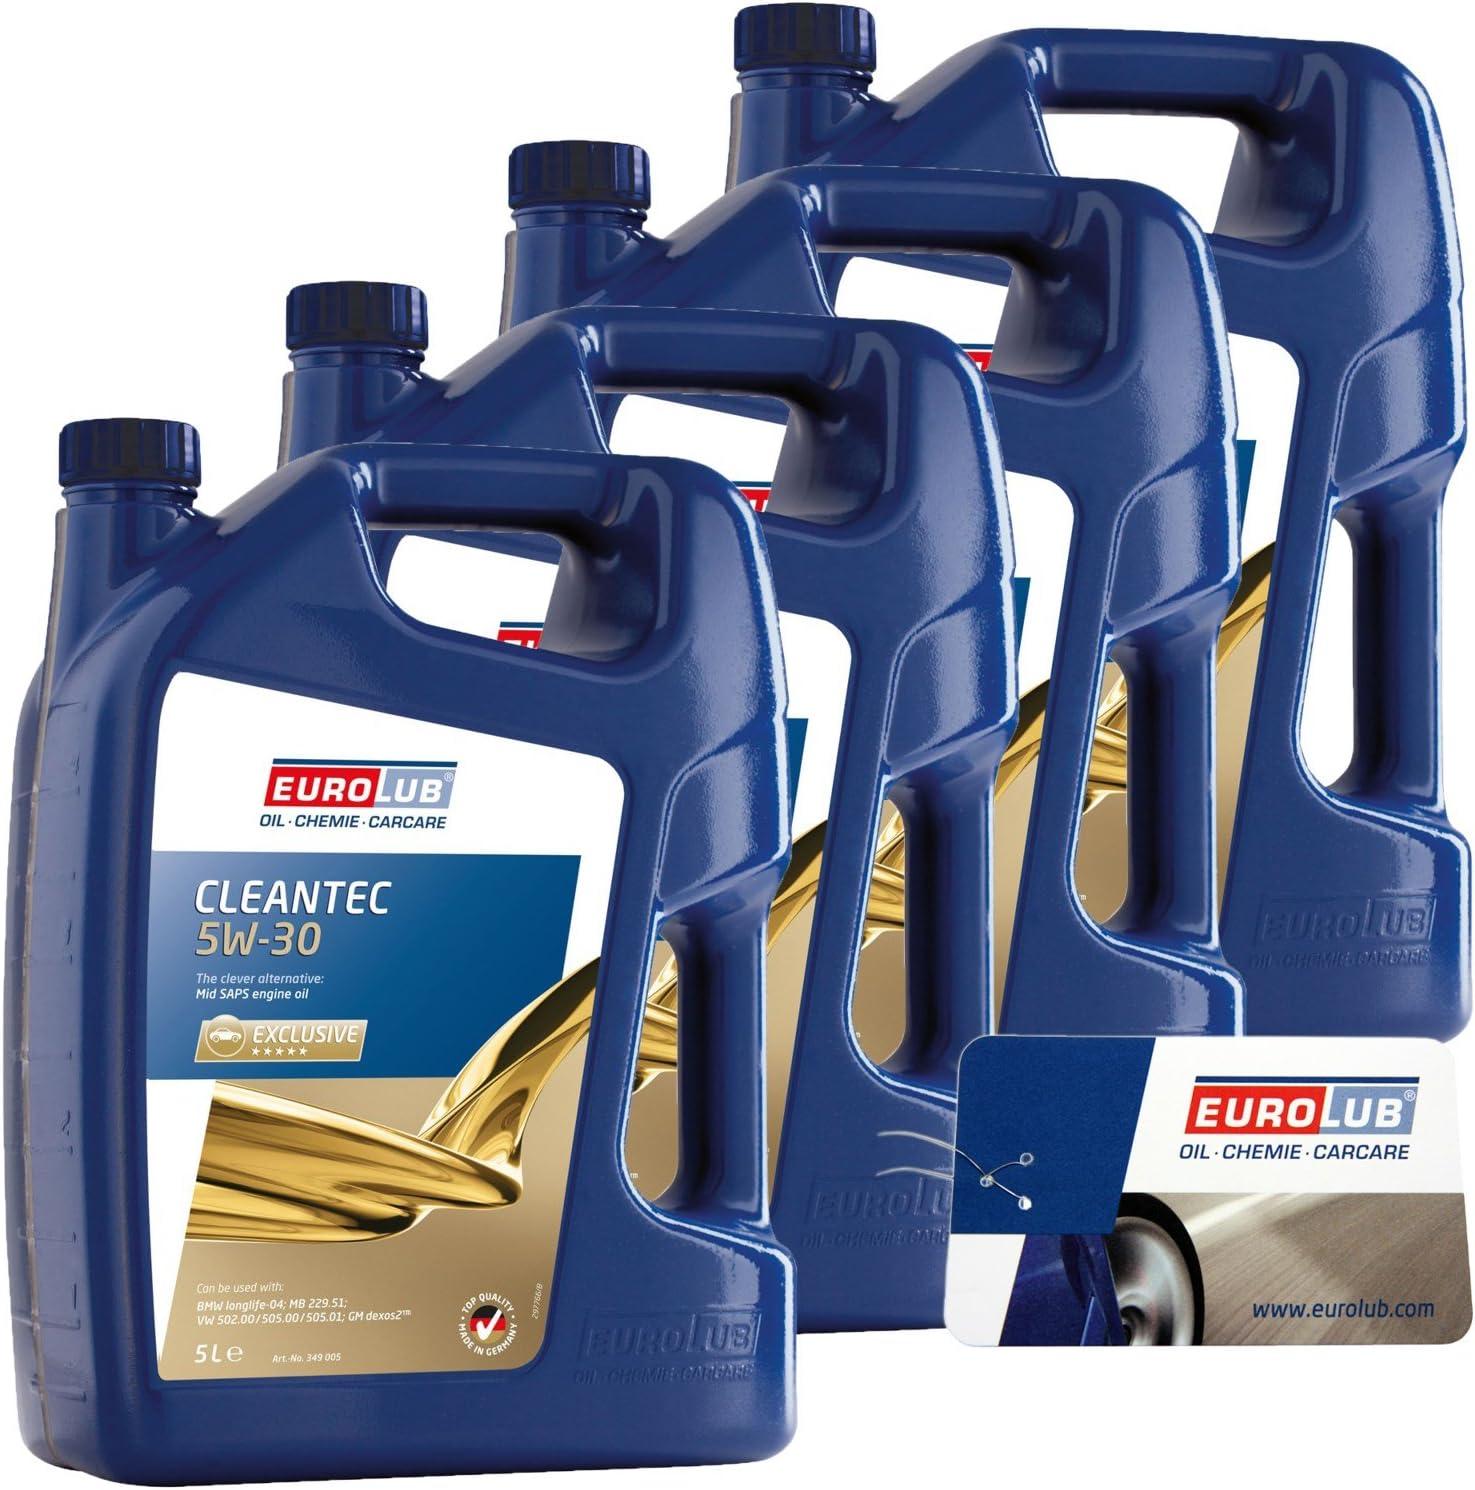 4x 5 Litre 20 Litres Eurolub Cleantec Mid Saps Engine Oil Sae 5 W 30 Engine Oil Auto